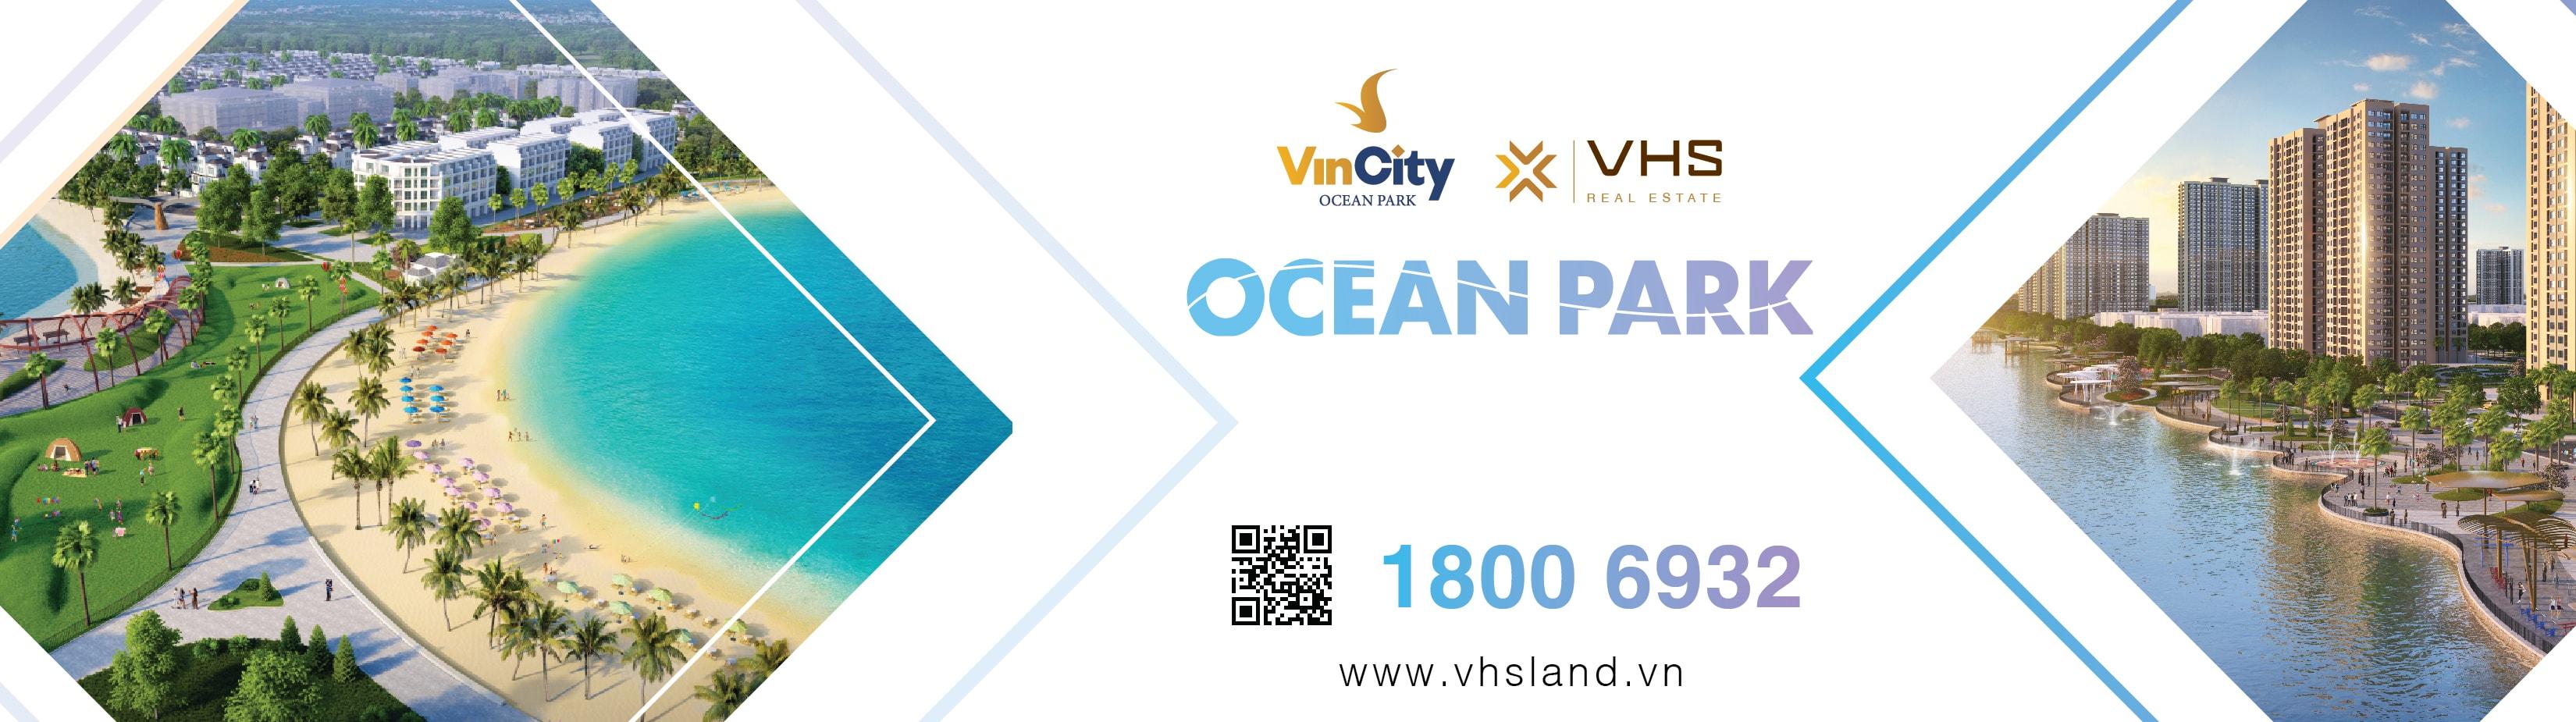 Vincity OCP